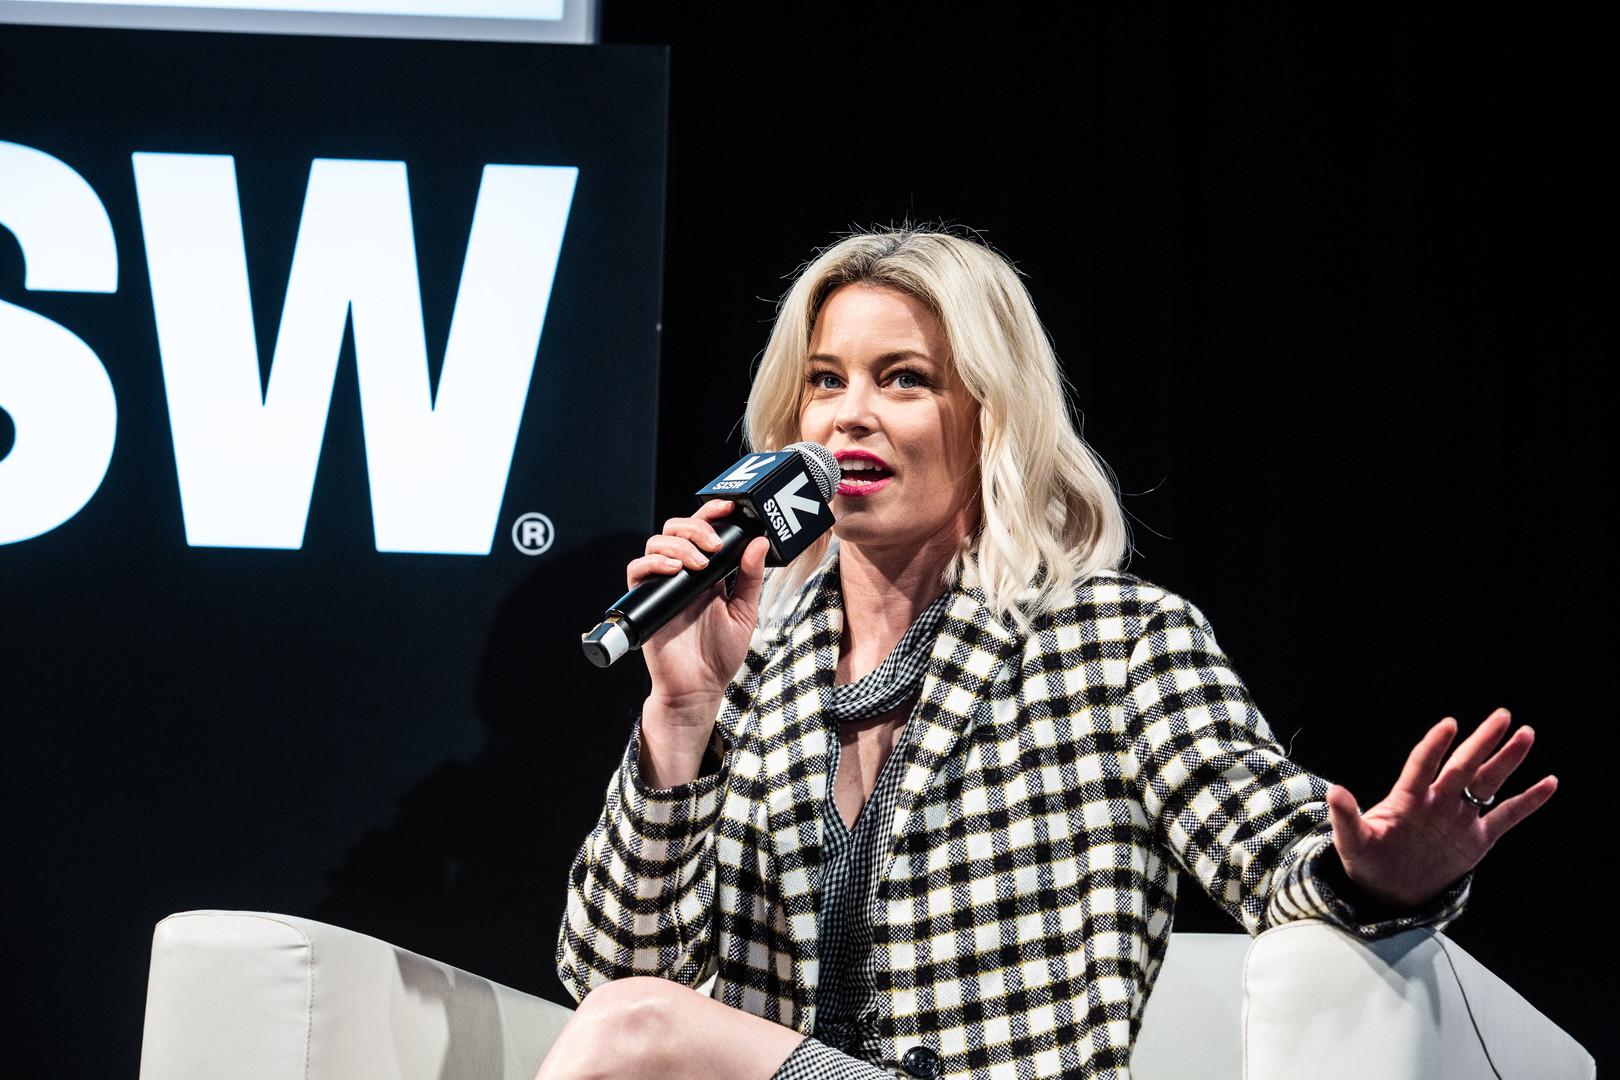 Elizabeth Banks @ SXSW 2019